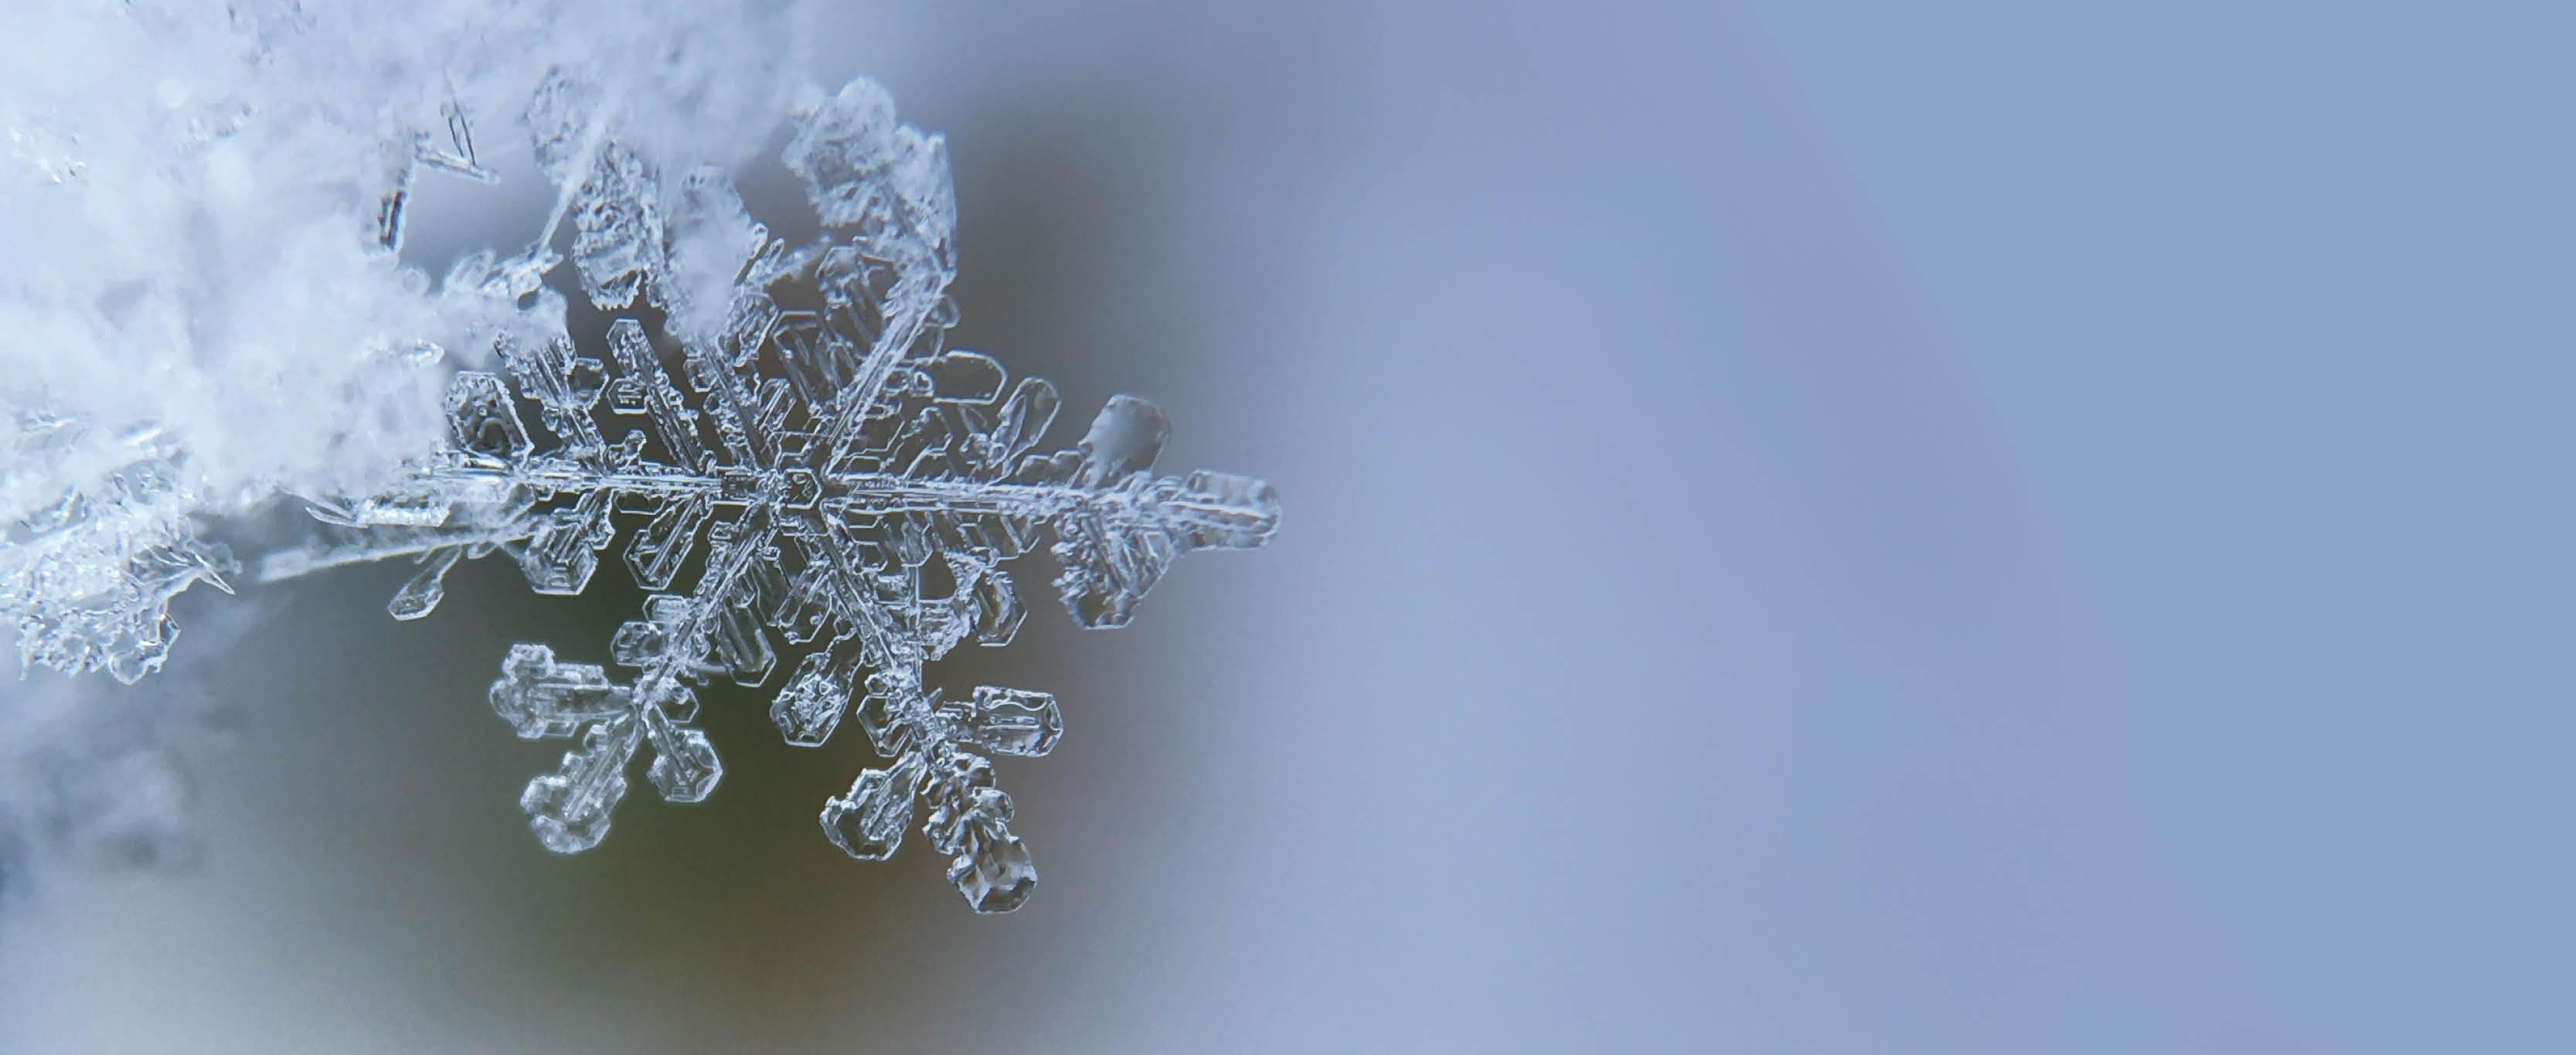 NCFADS-Winter-School-Homepage-Splash-Background